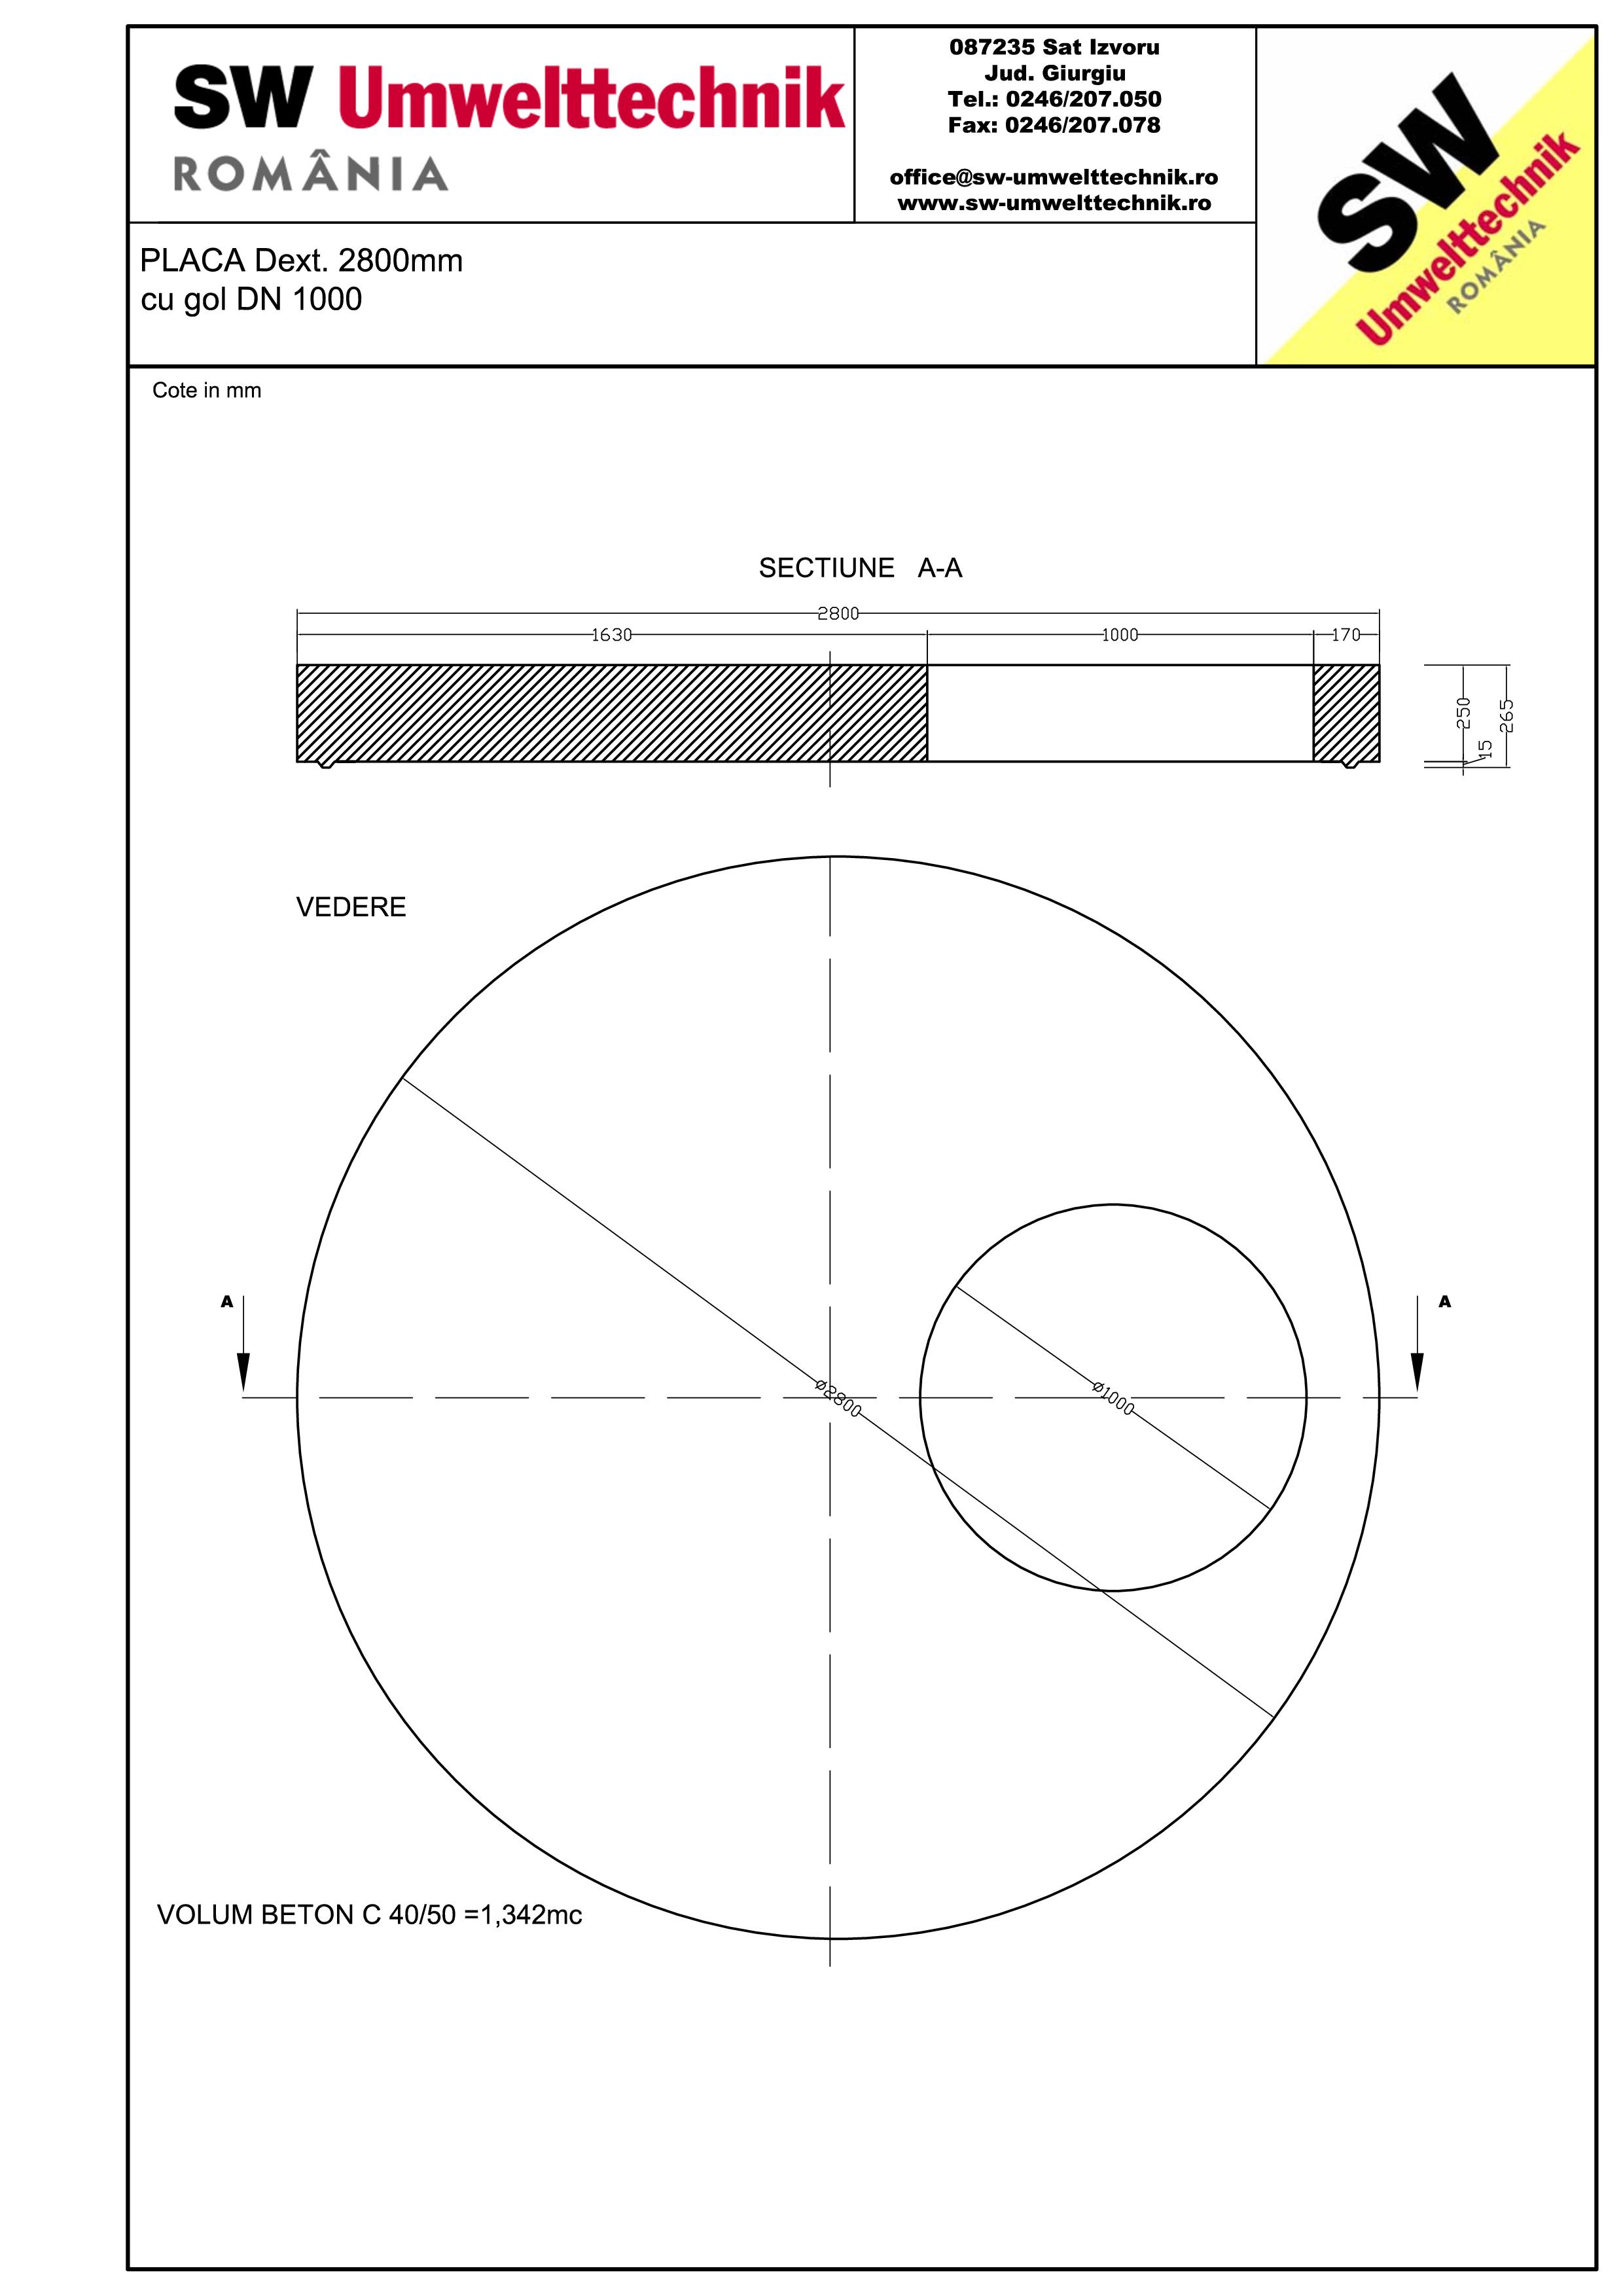 Pagina 1 - CAD-PDF Placa Dext. 2800 H250 cu gol DN1000 SW UMWELTTECHNIK Detaliu de produs